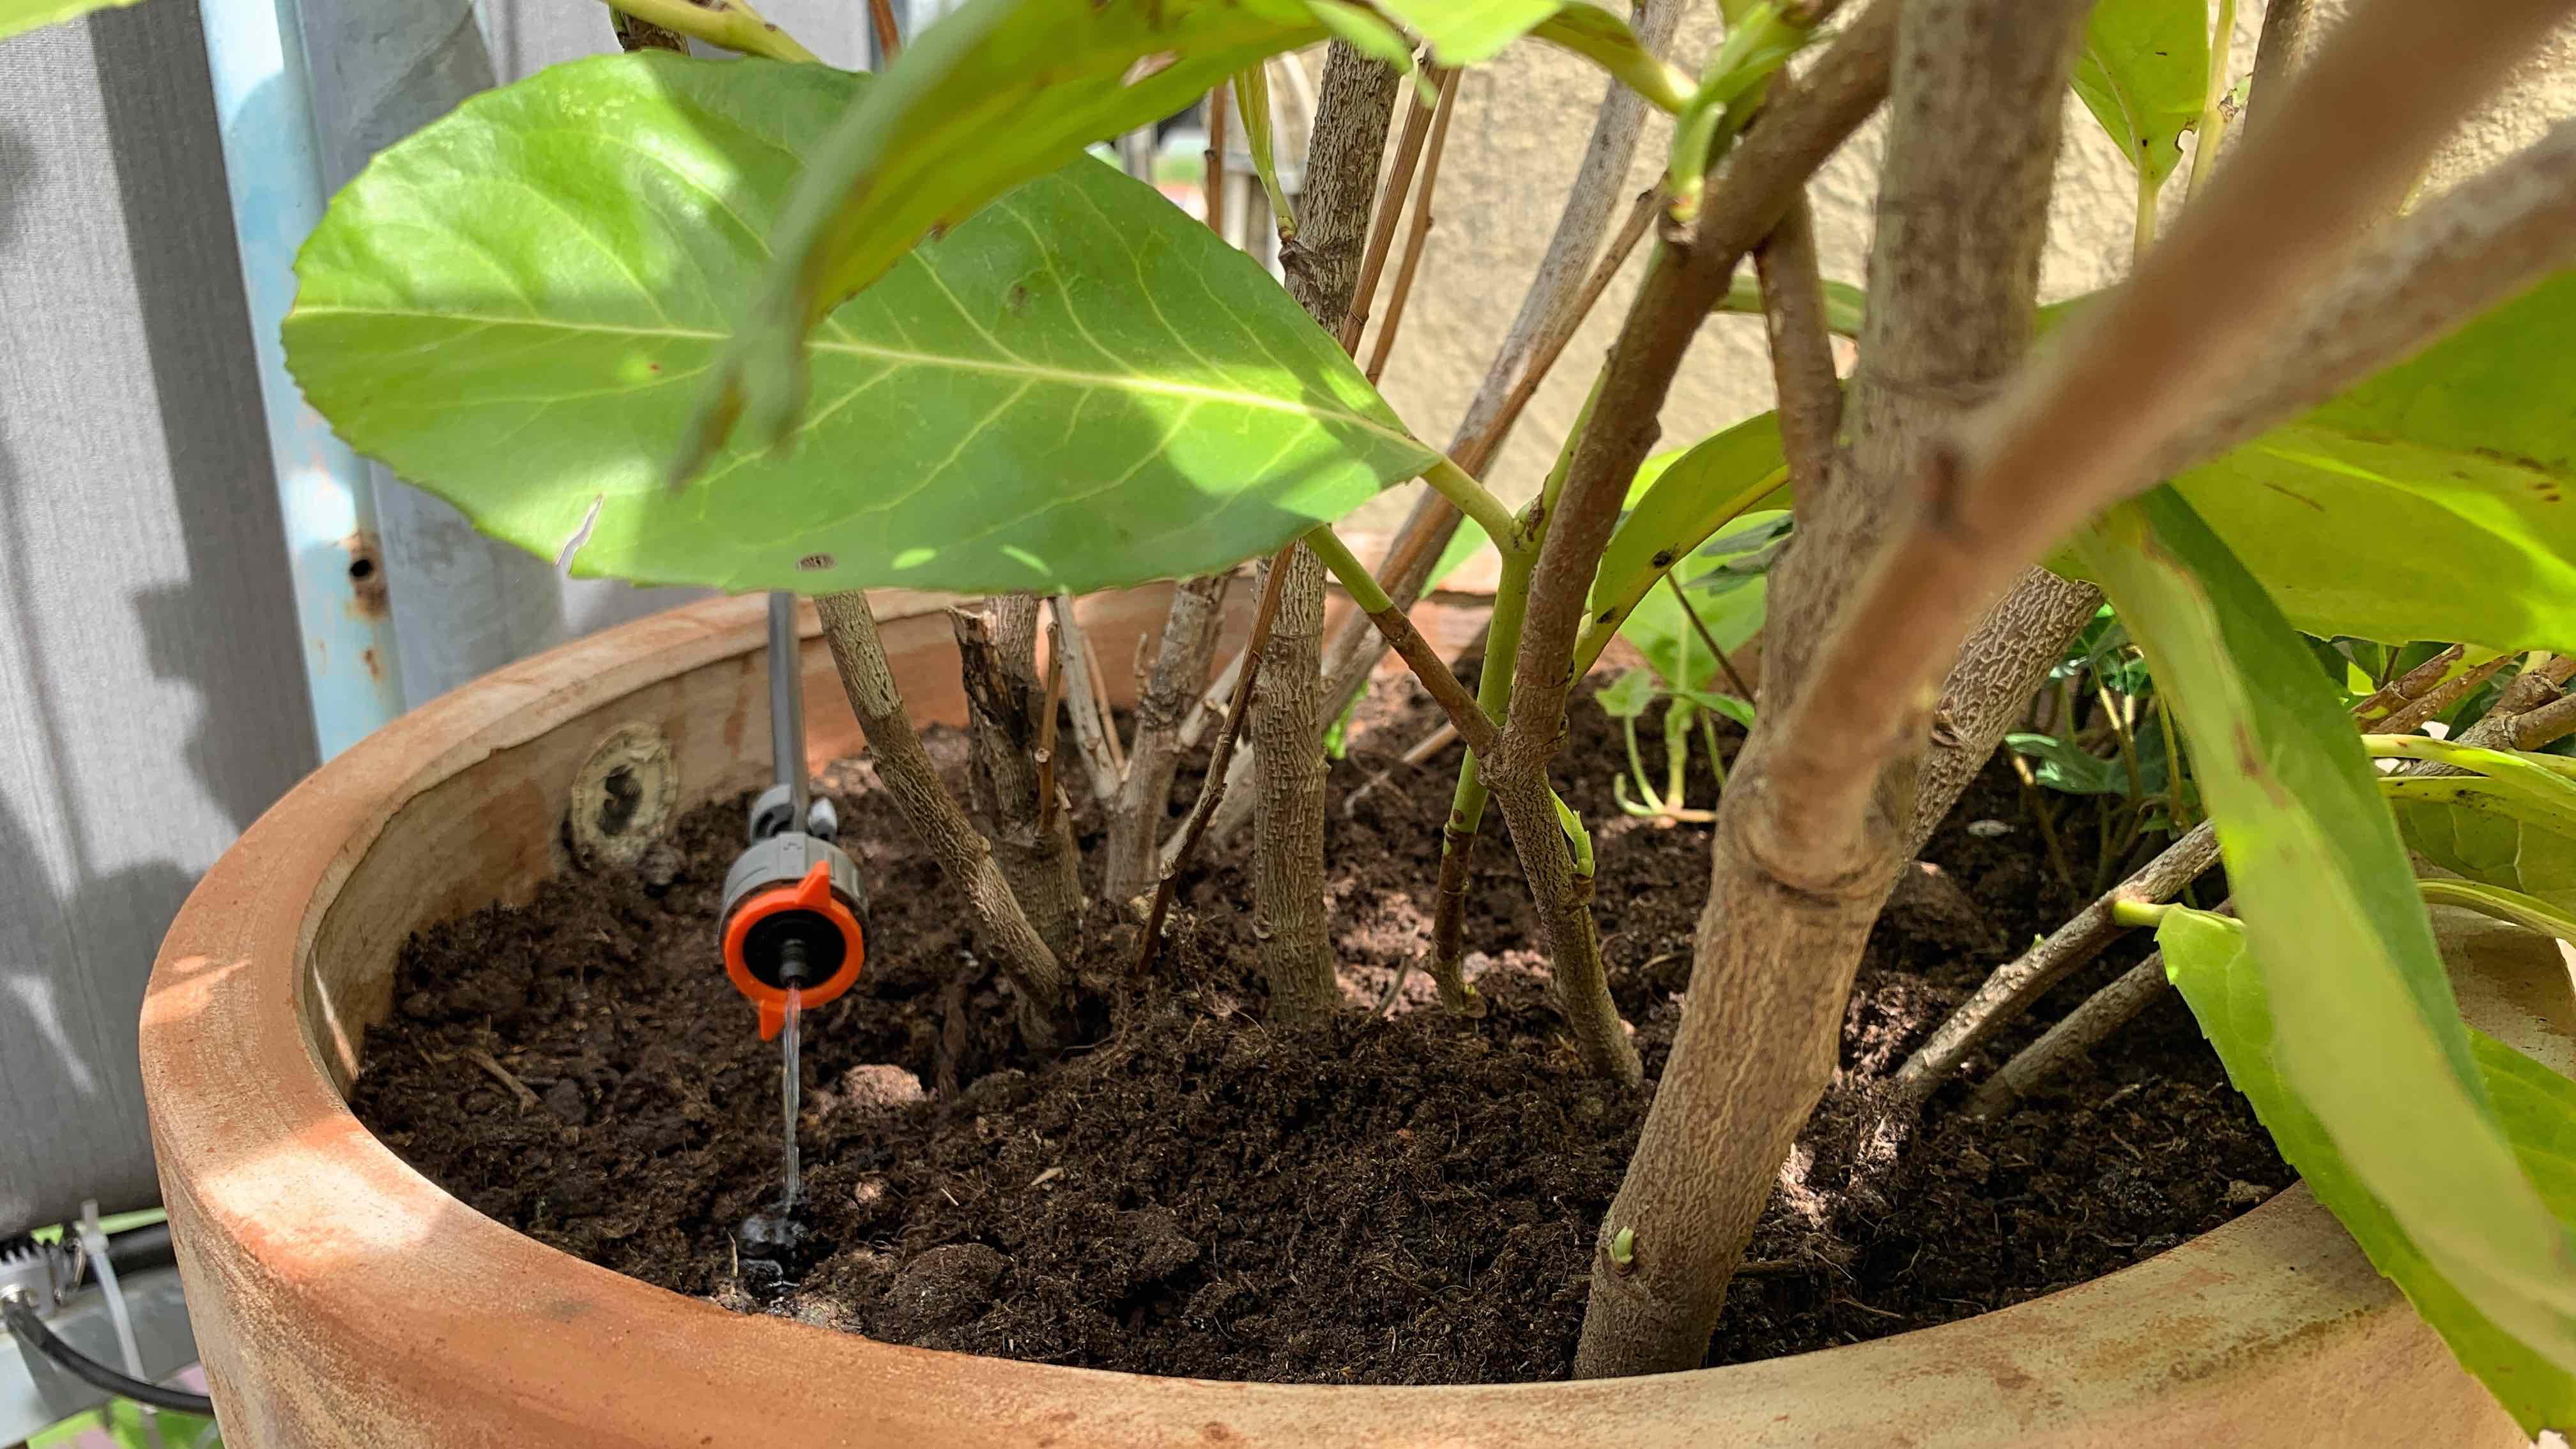 Eve_Aqua_HomeKit_Gardena_Terrasse_Balkon_Pflanzen_Bewässerung4 Wie HomeKit deine Pflanzen auf Balkon/Terrasse automatisiert bewässert